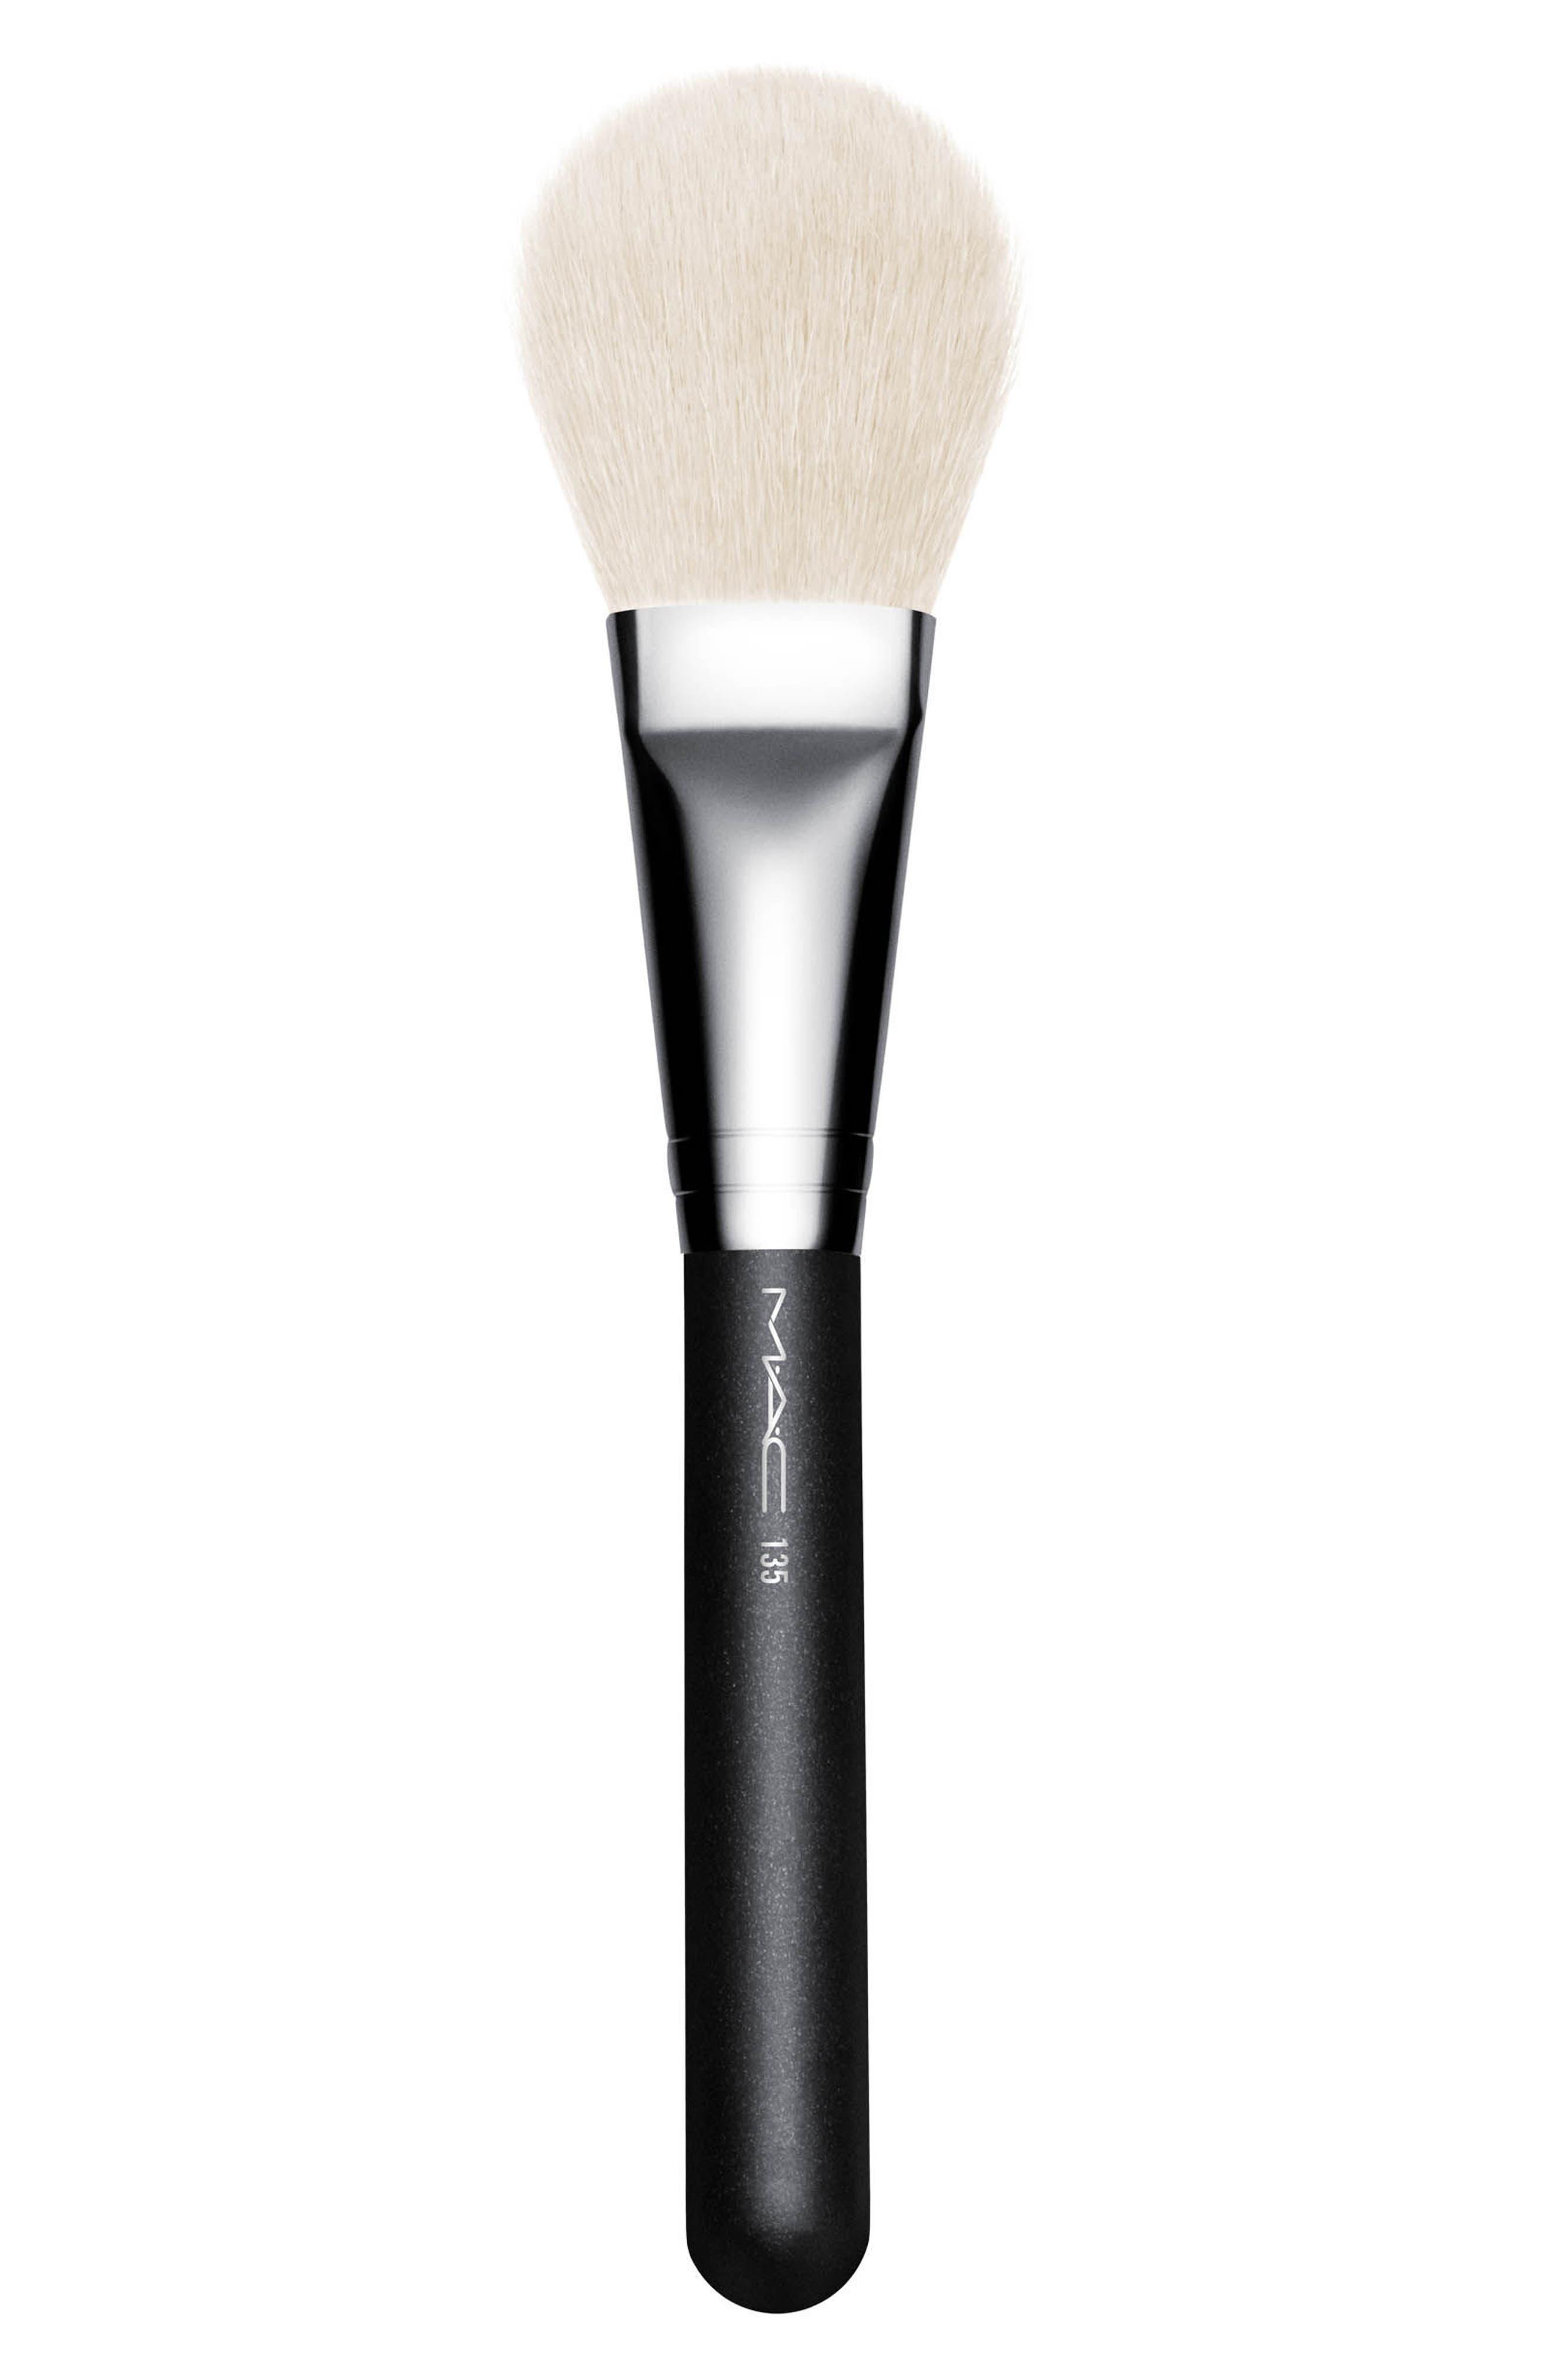 MAC 135 Large Flat Powder Brush,                         Main,                         color, 000